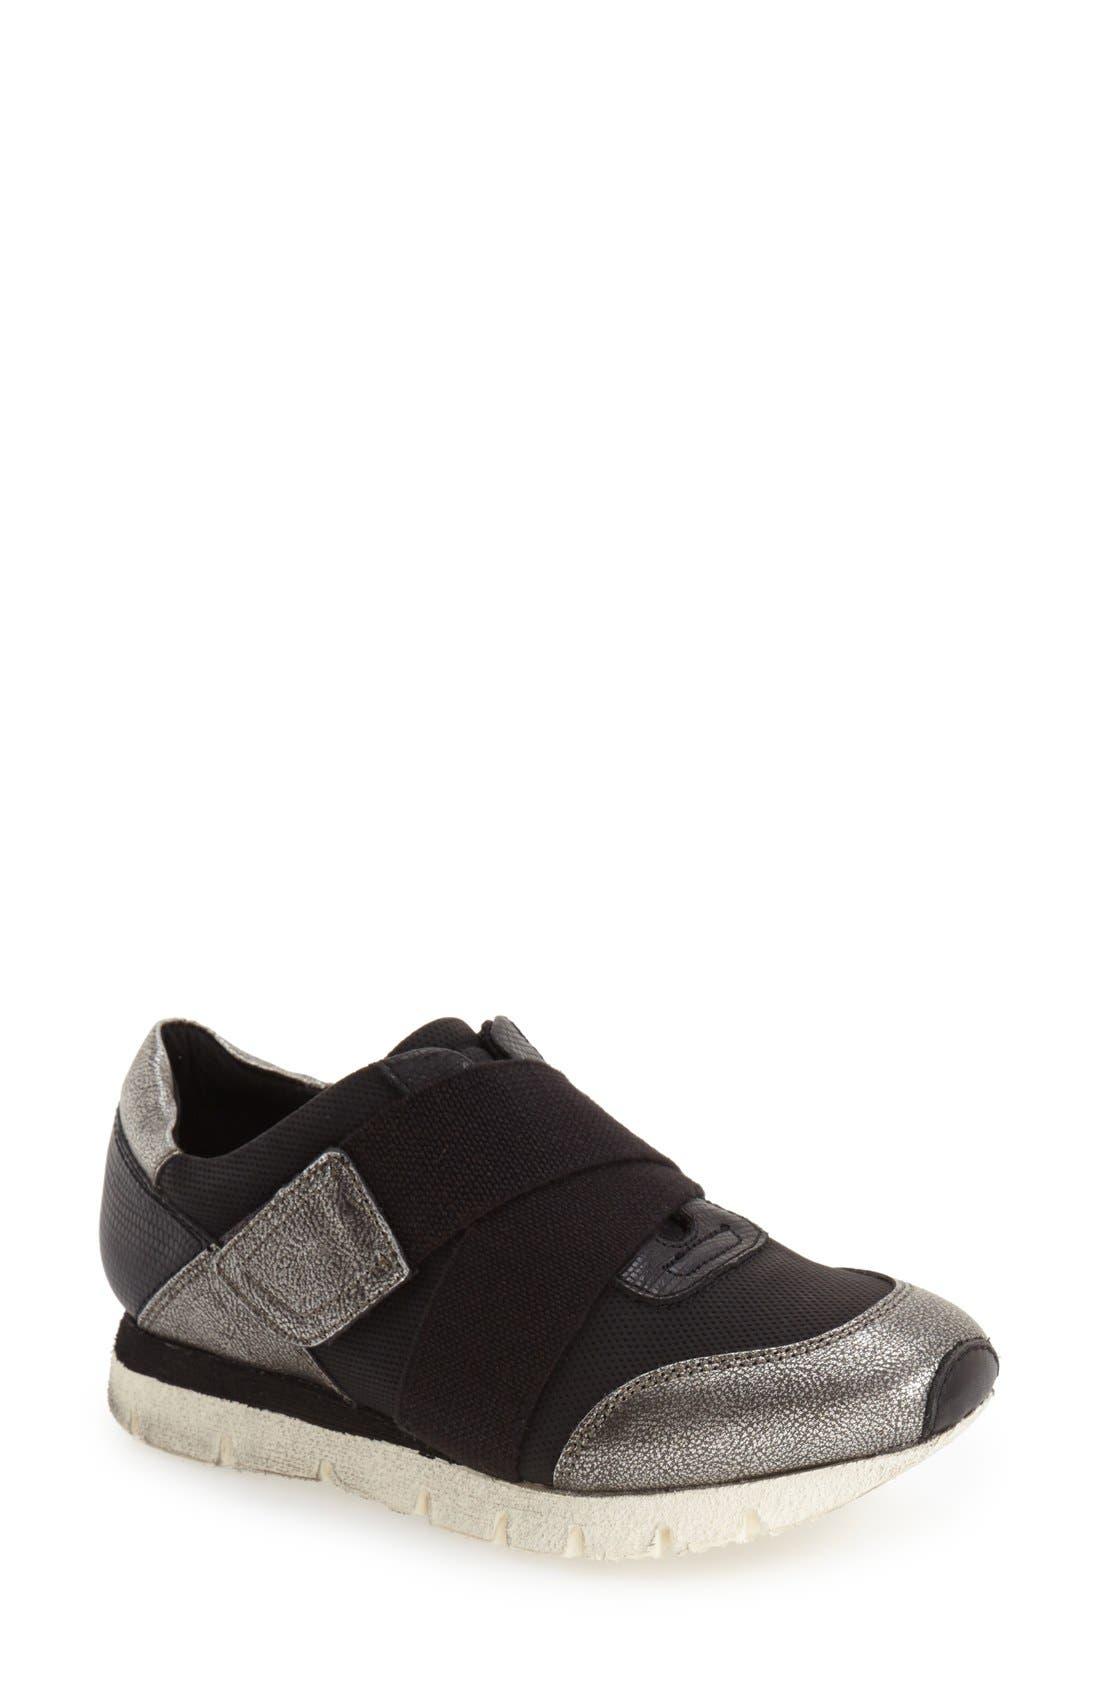 'New Wave' Sneaker,                             Main thumbnail 1, color,                             003